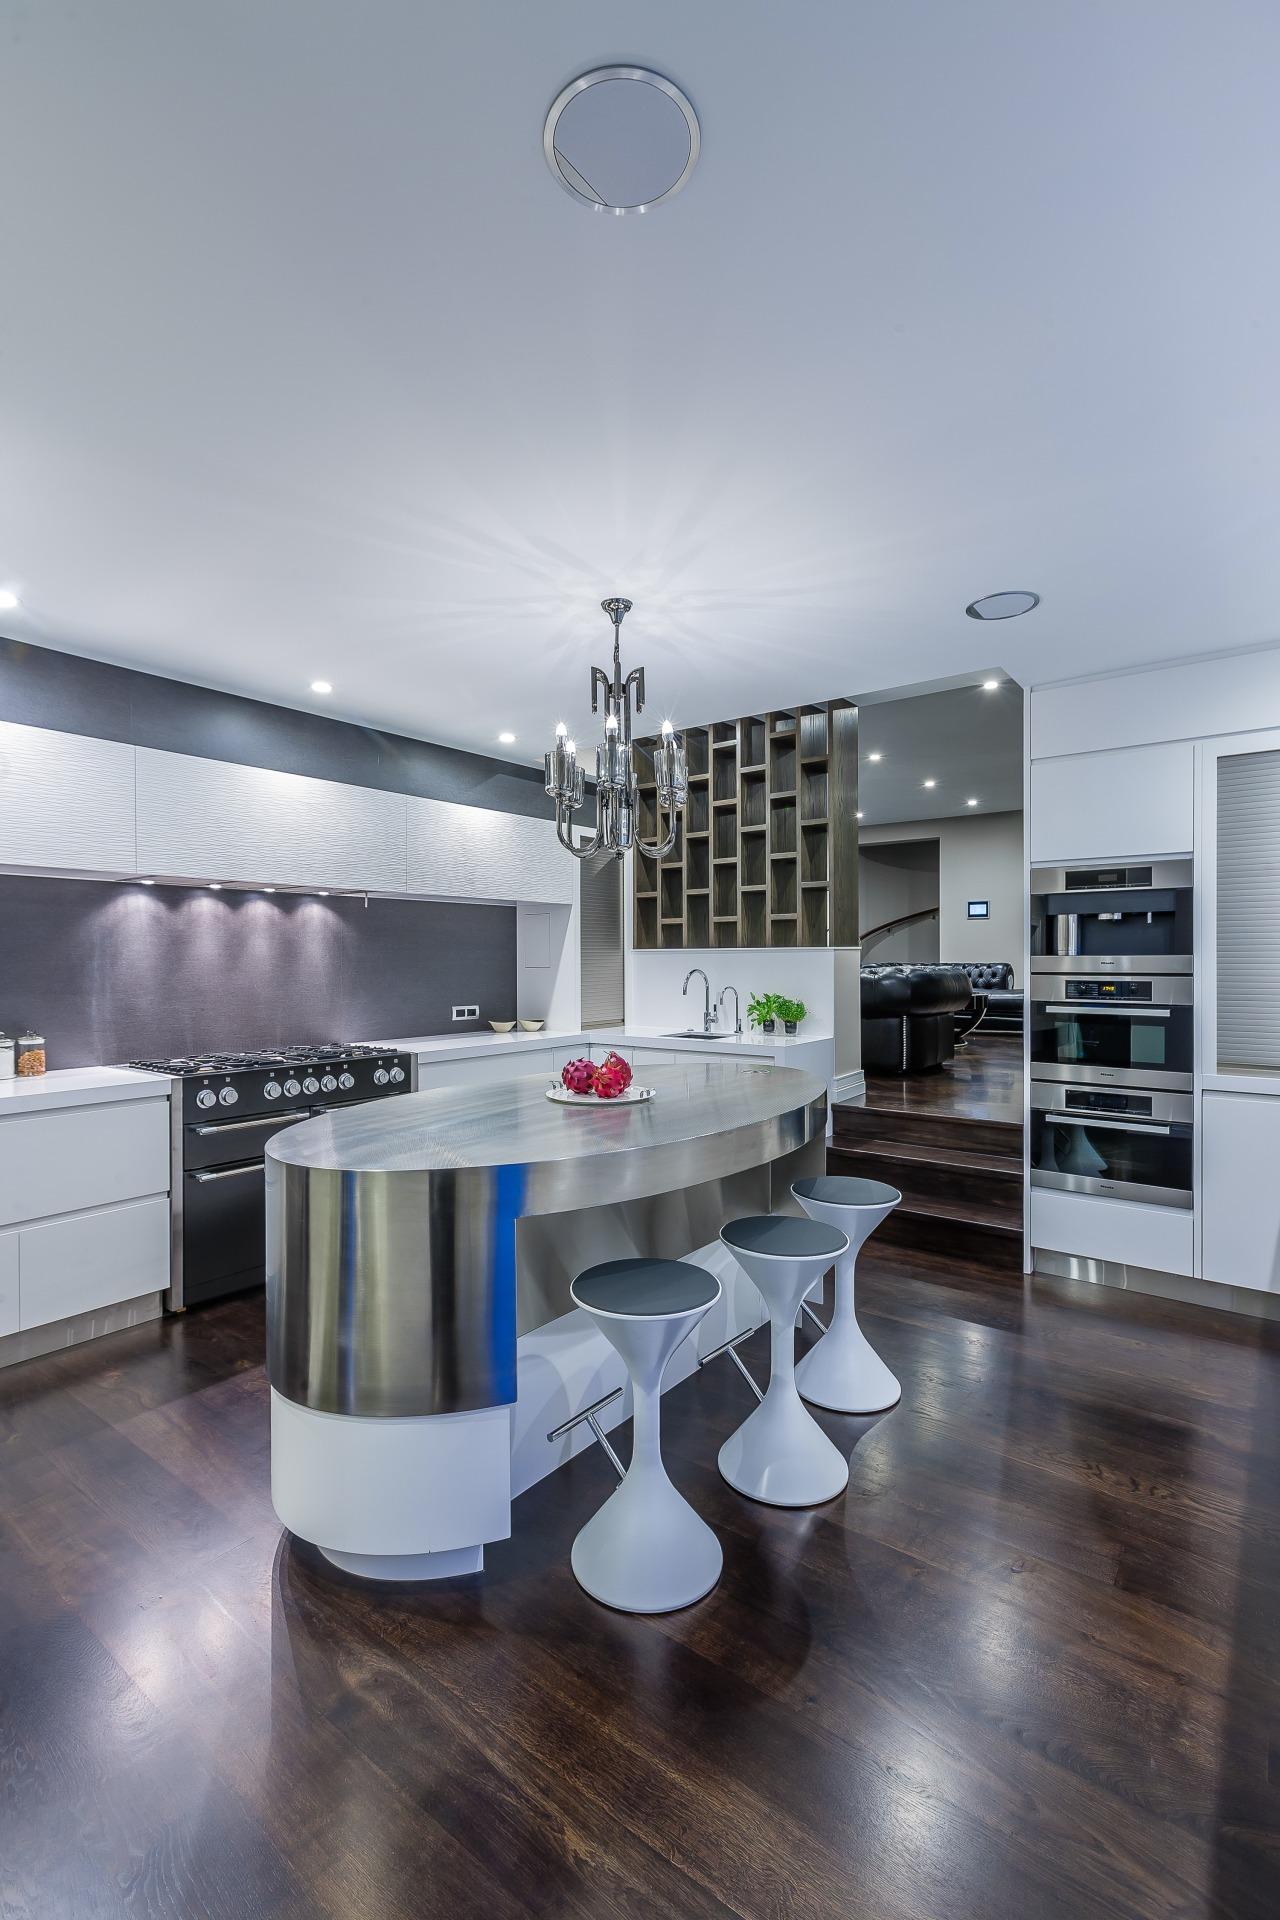 Crisply modern kitchen by Du Bois Design. Photography interior design, kitchen, product design, gray